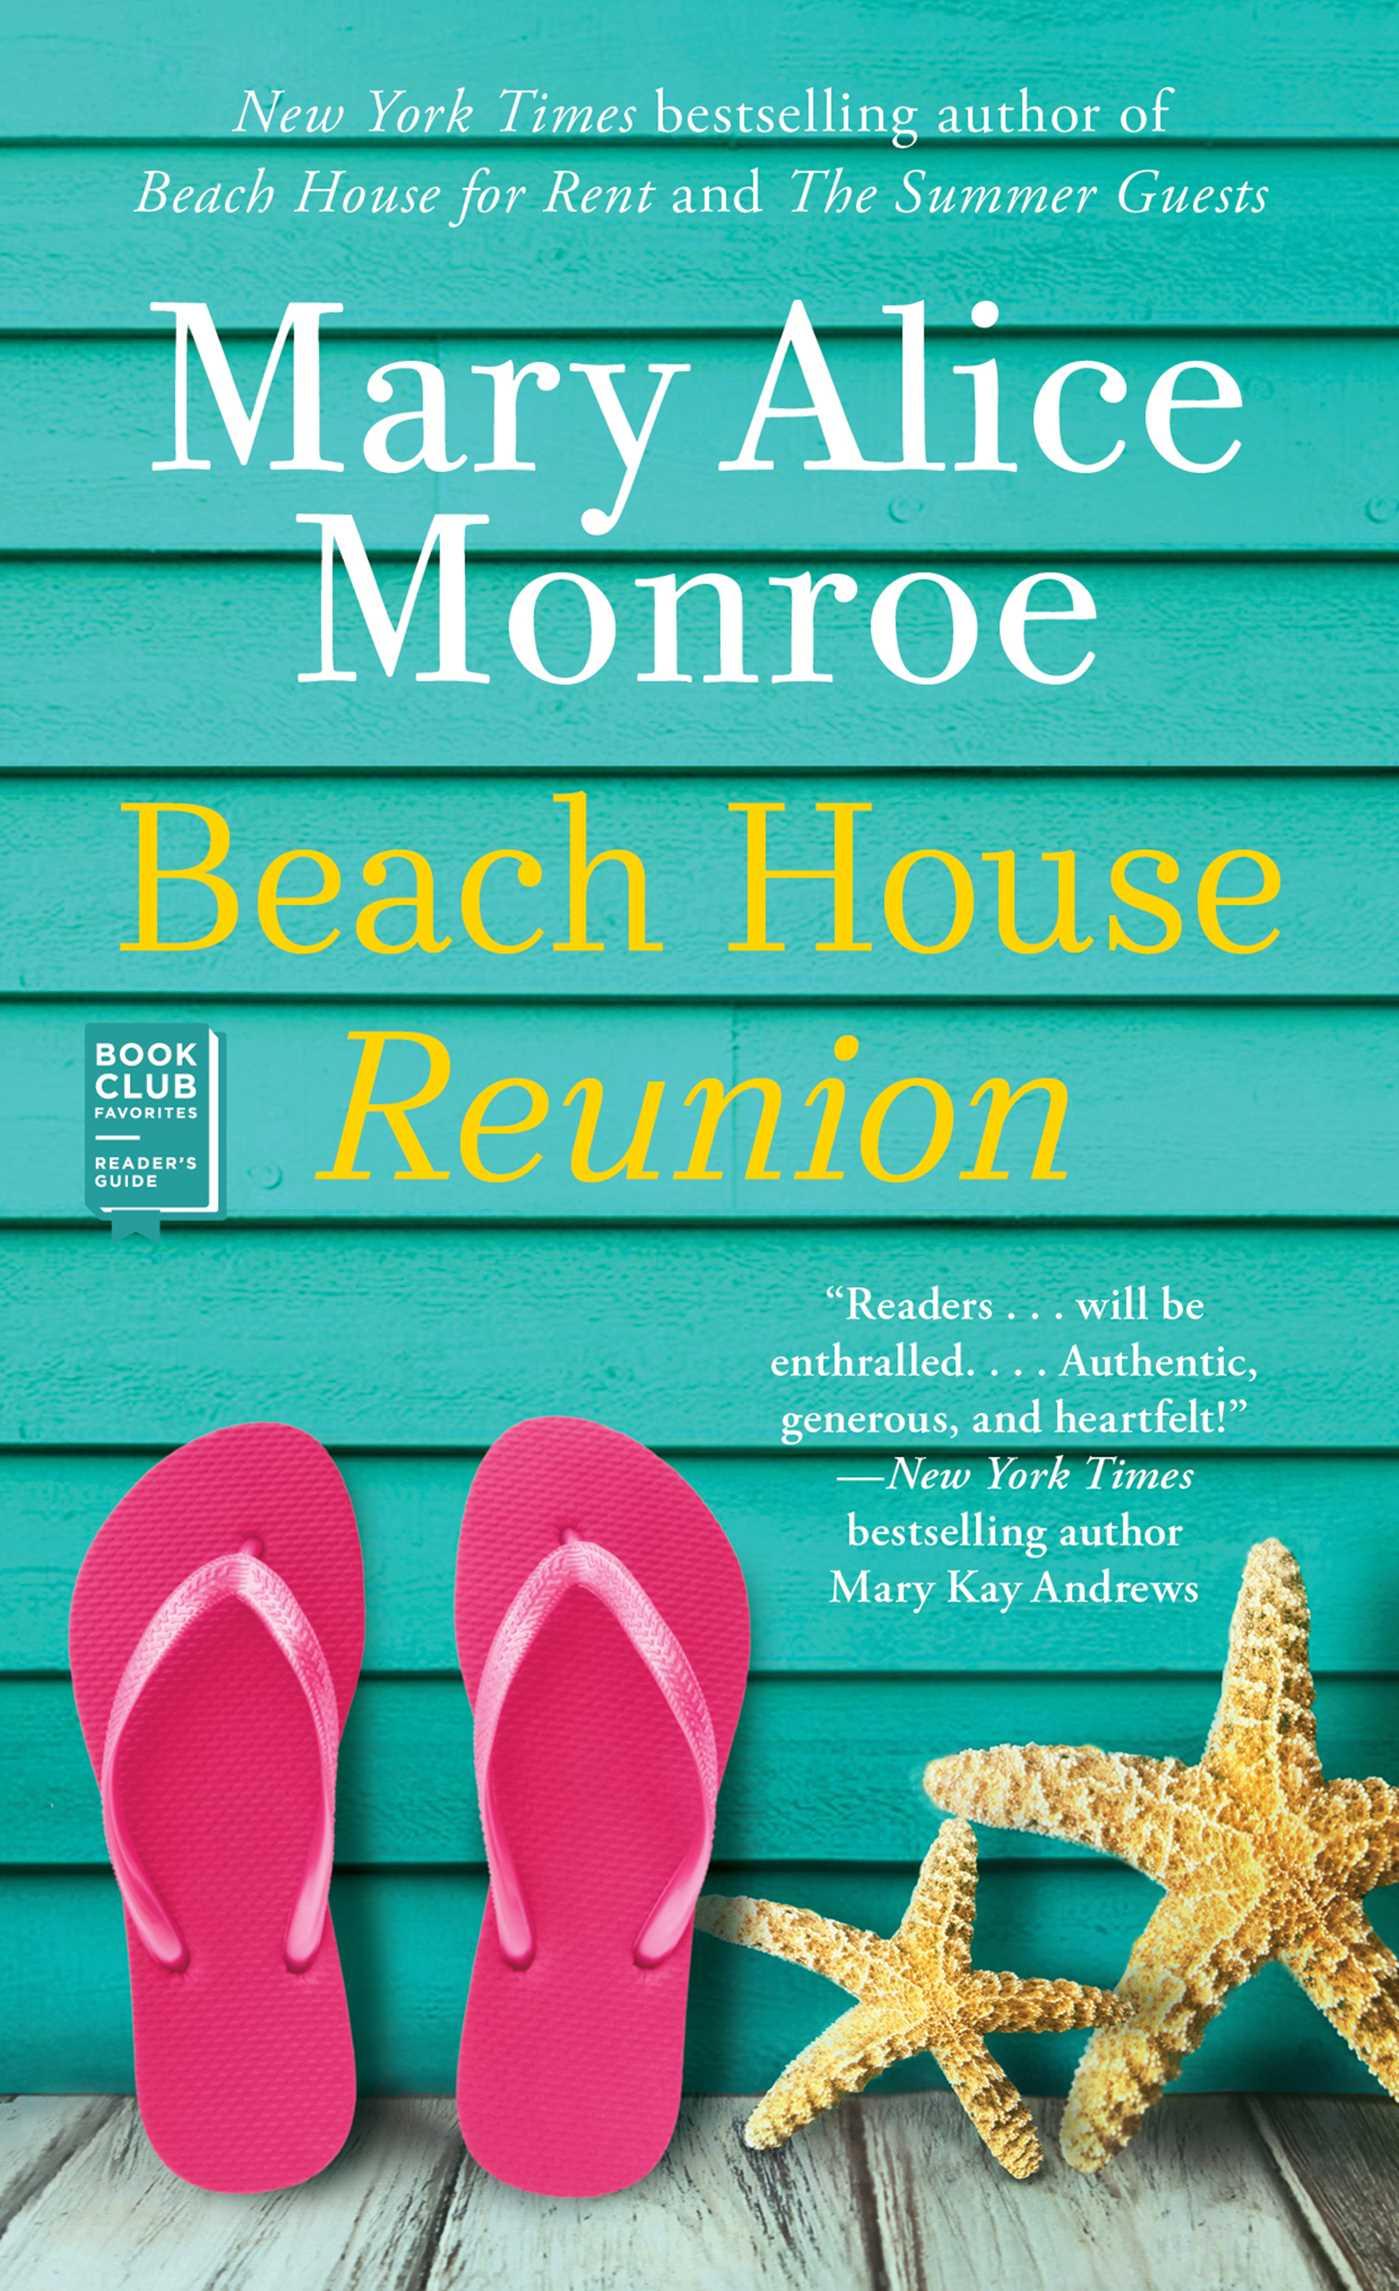 Beach House reunion cover image